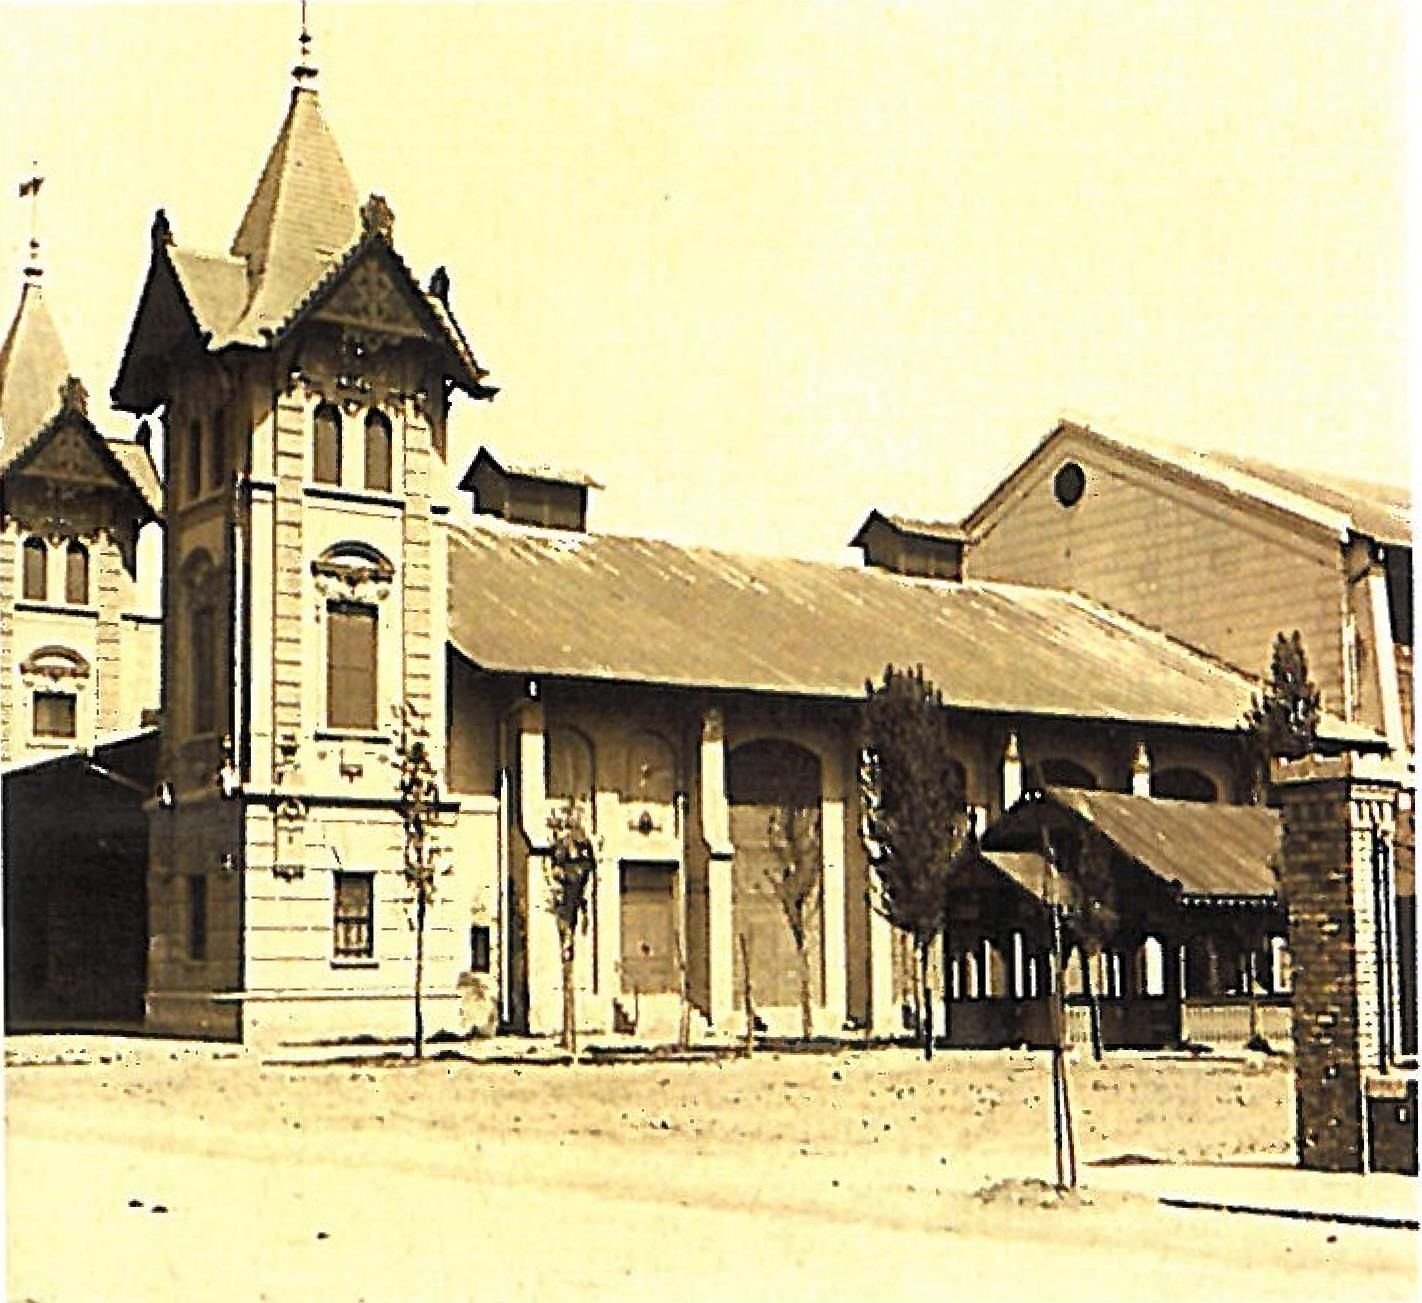 Aradi Nyari Szinhaz 1900